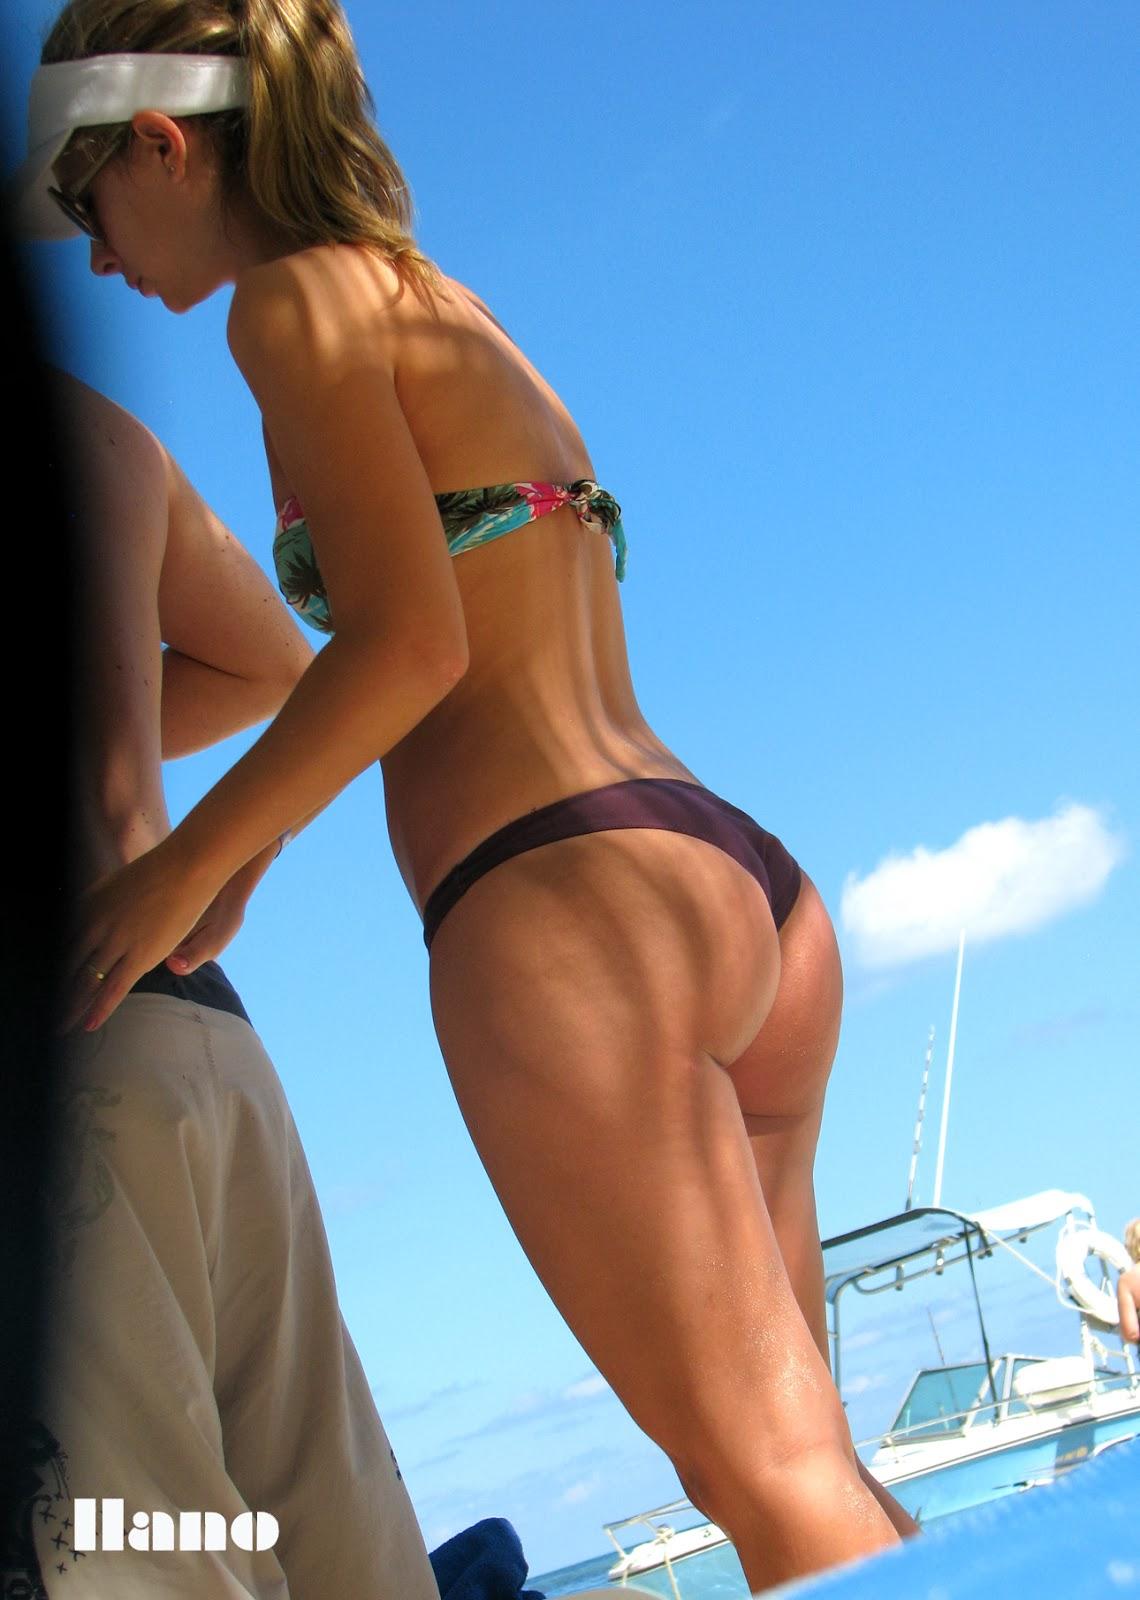 Full body examination women nude